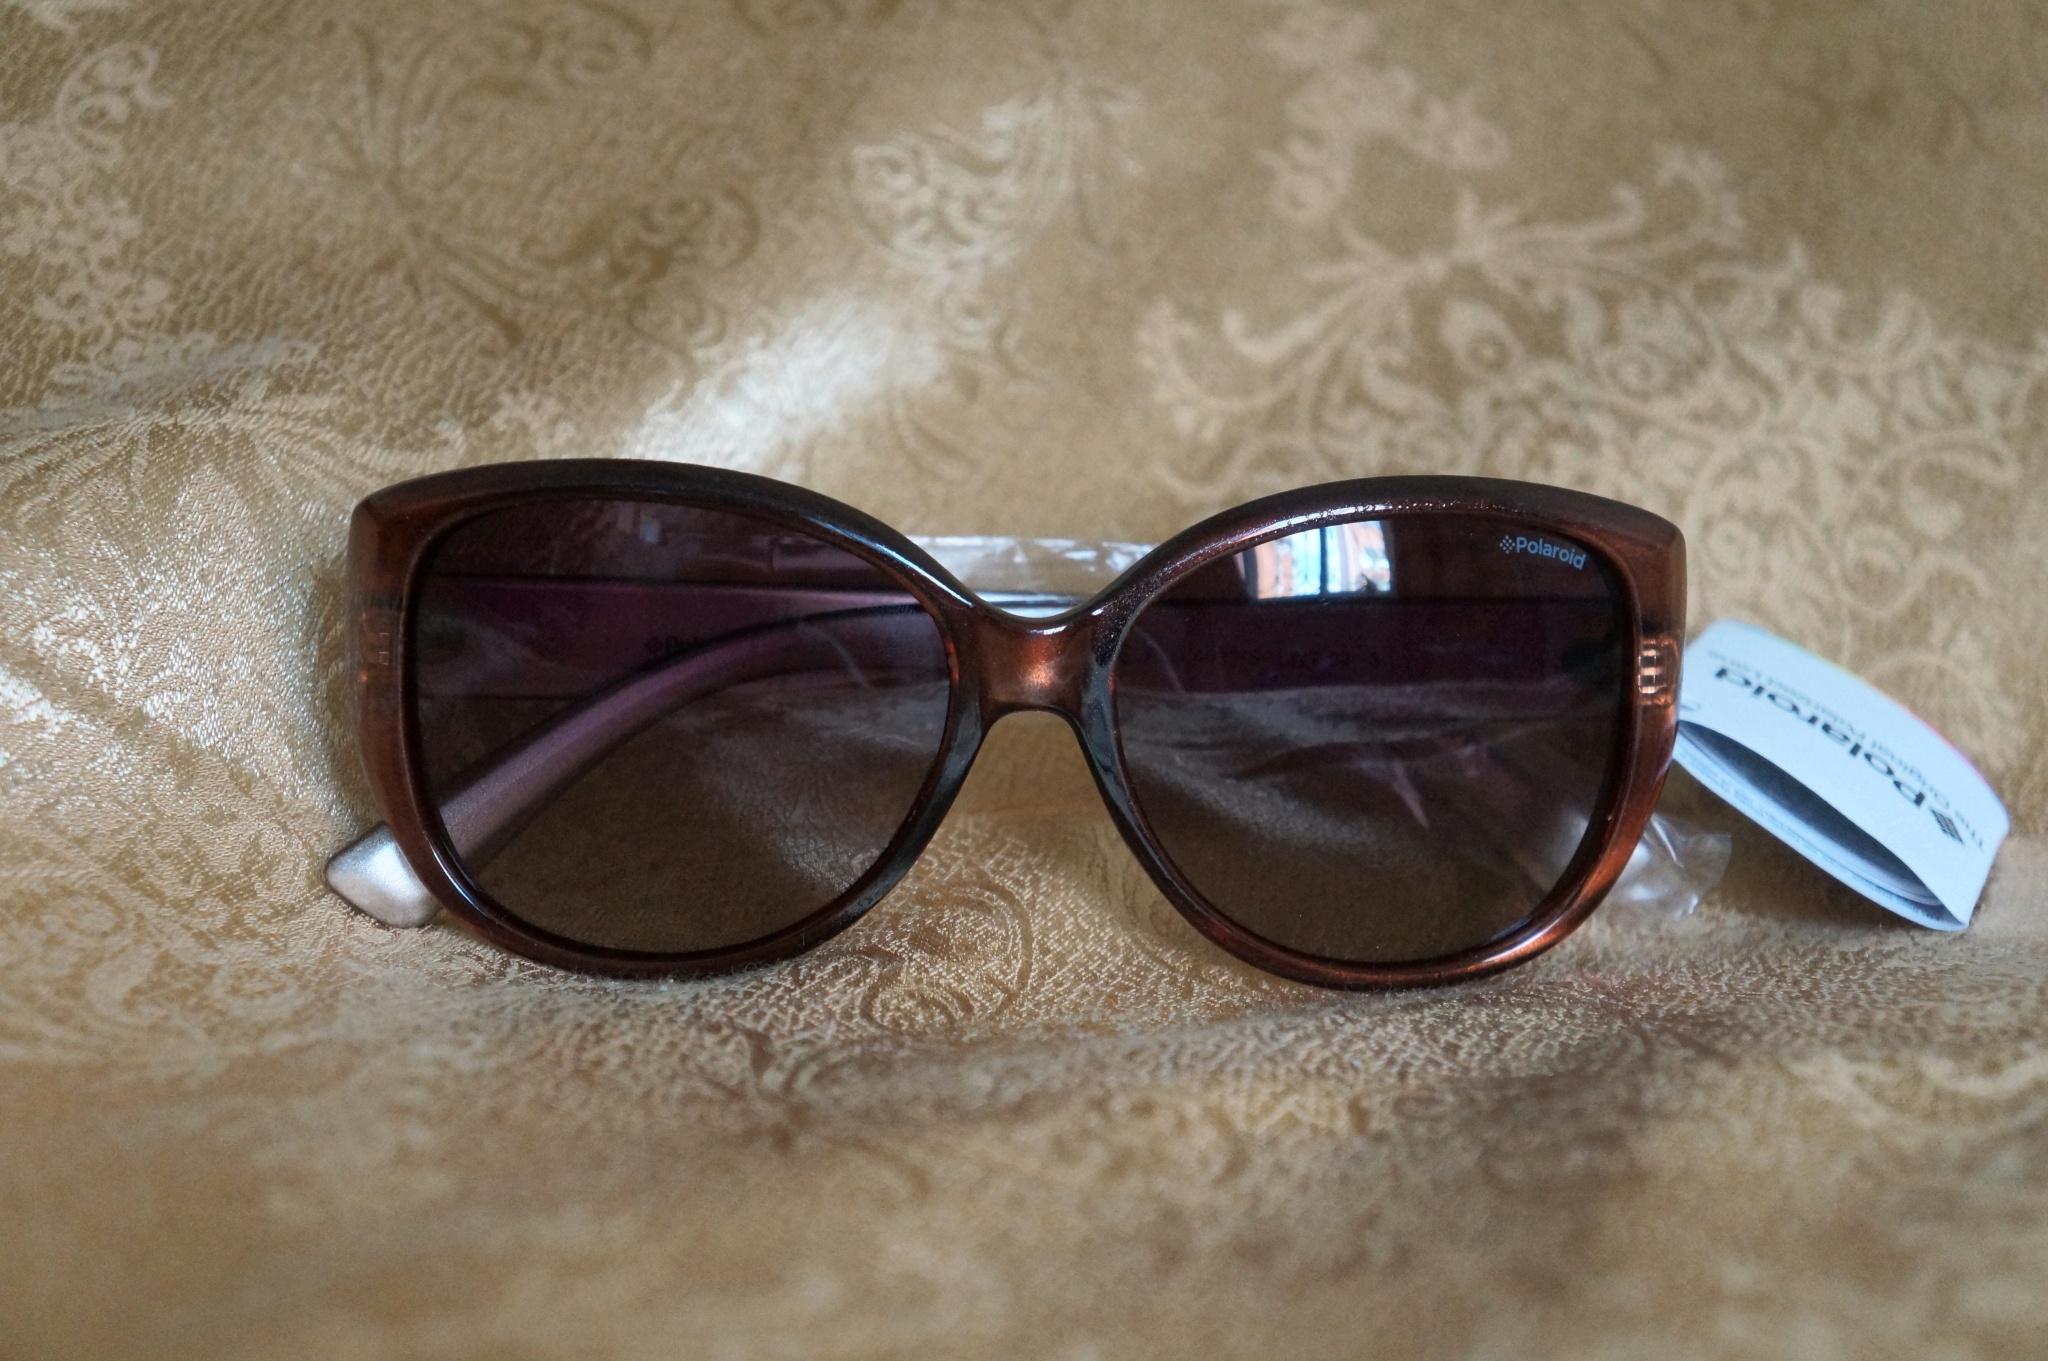 Обзор от покупателя на Солнцезащитные очки POLAROID PLD 4031 S cdc8e09c3dd